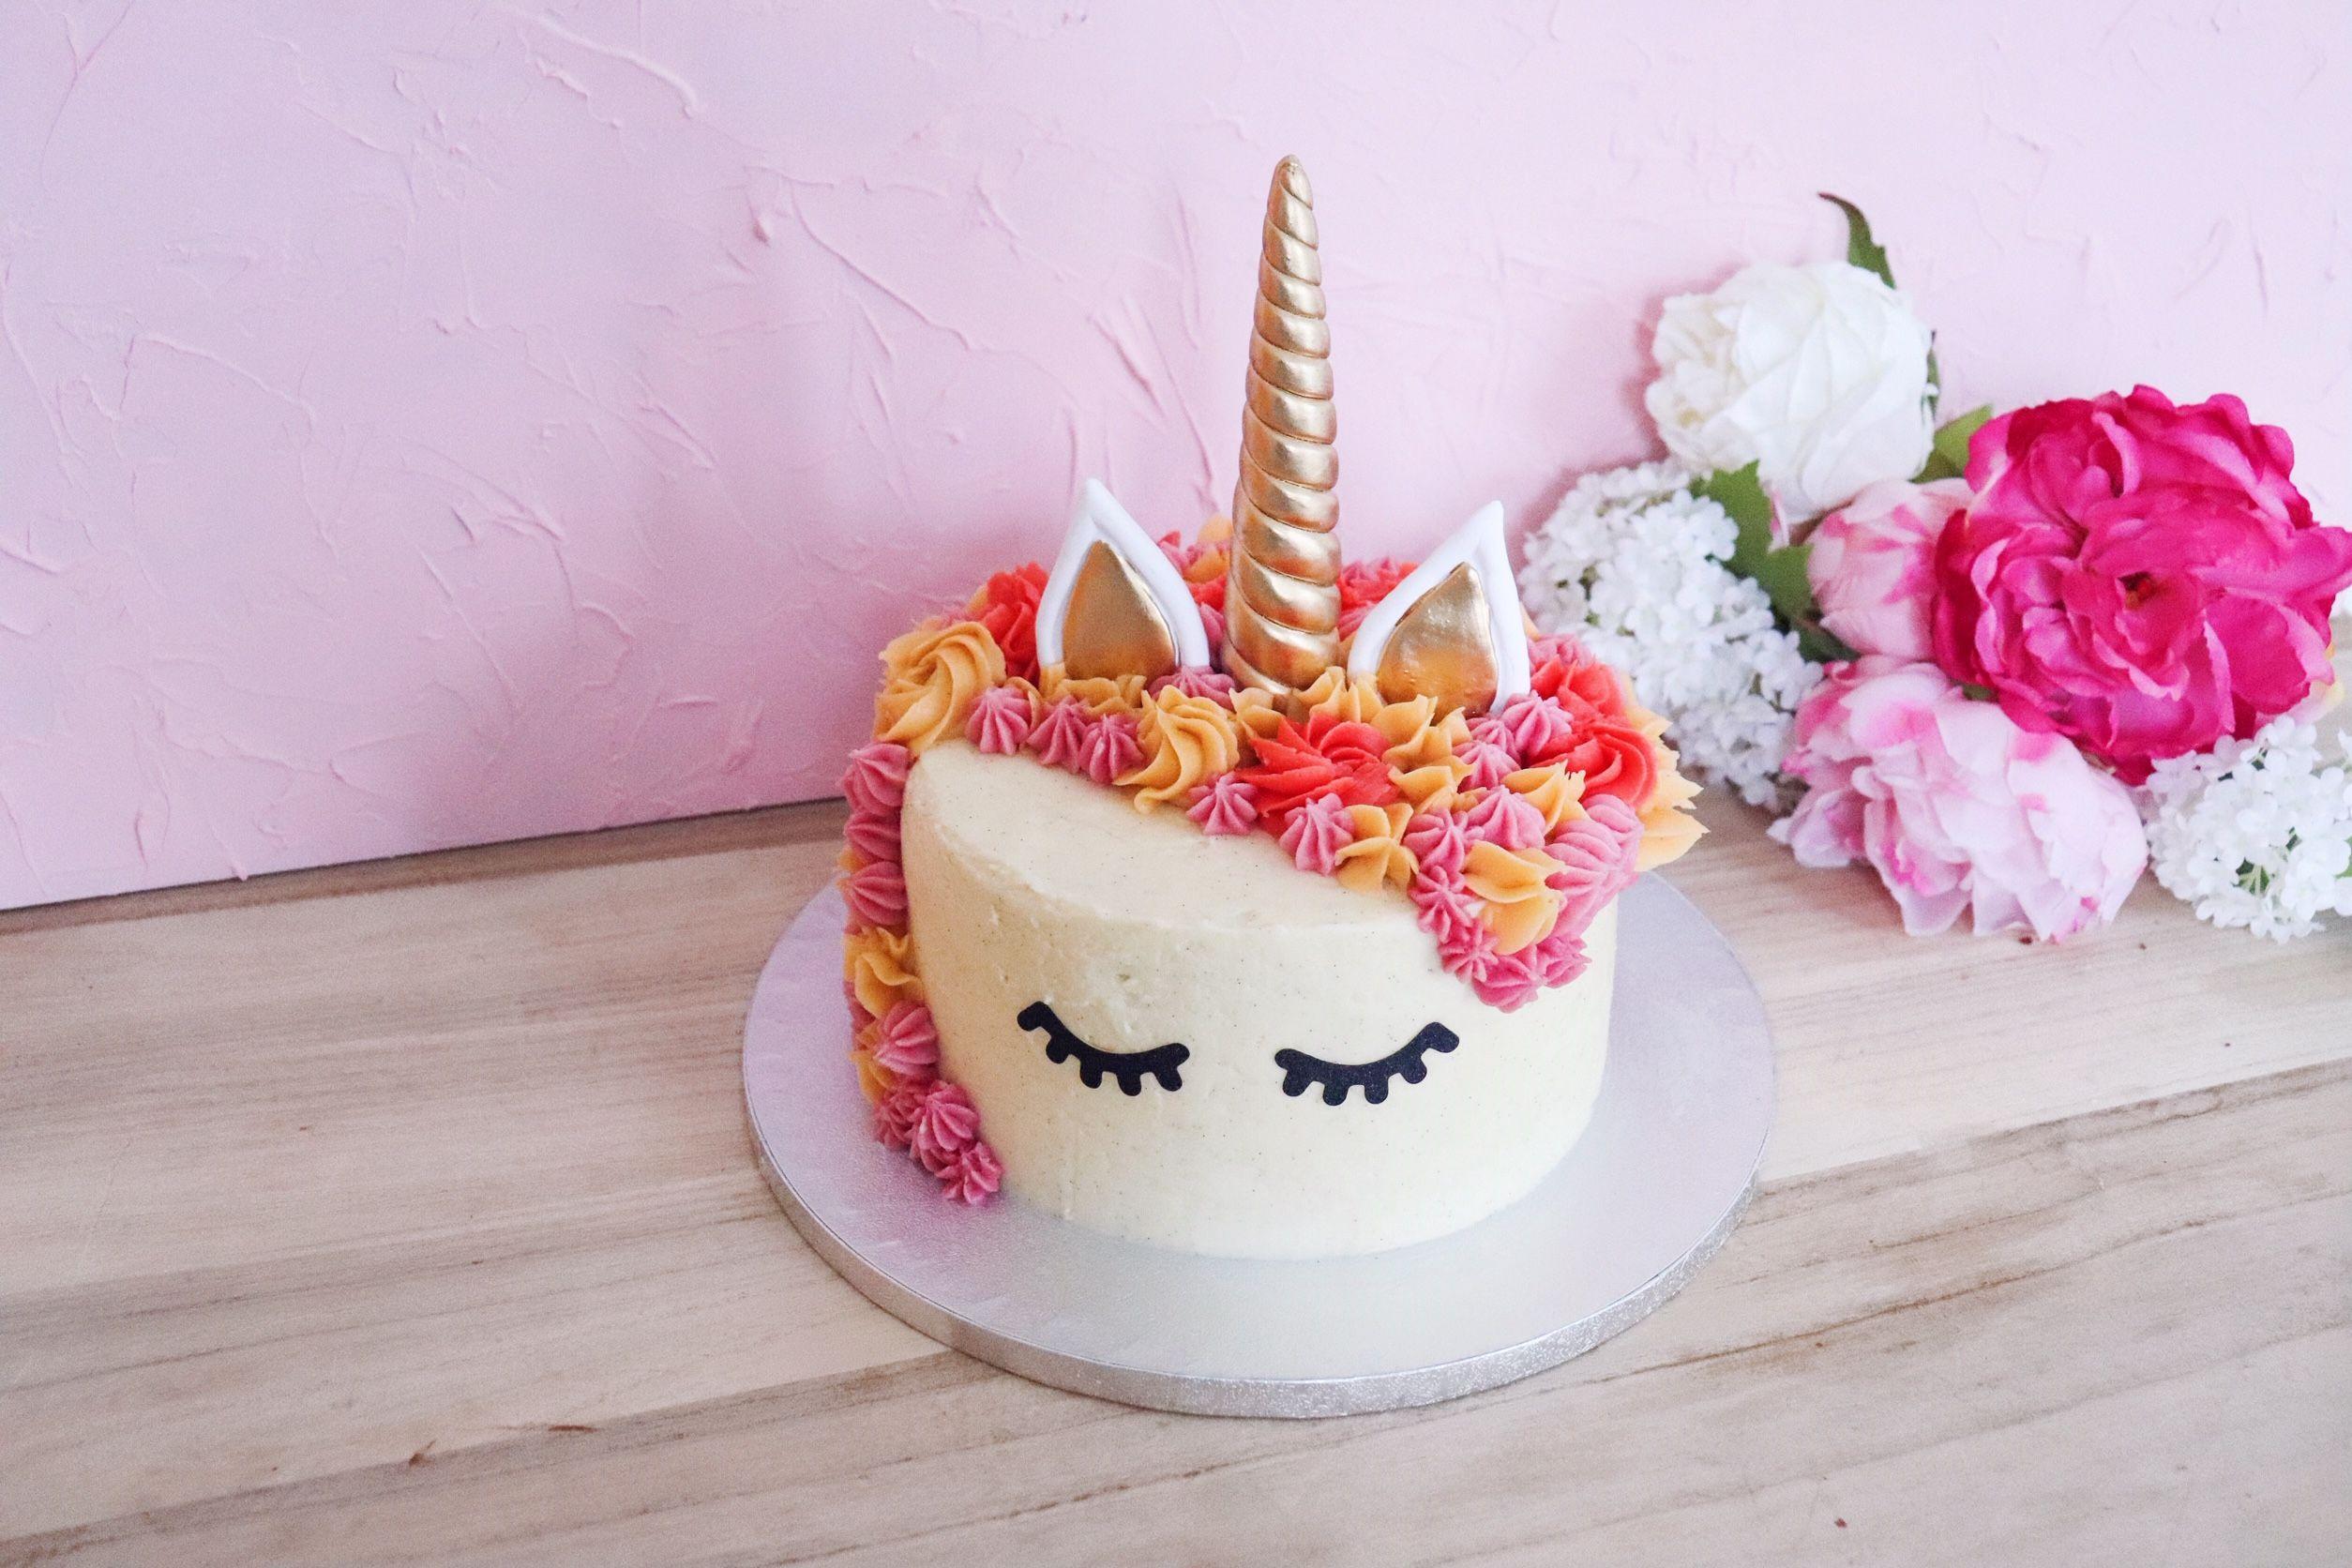 licorne cake fraise vanille recette patisserie léa patisseries inspirées